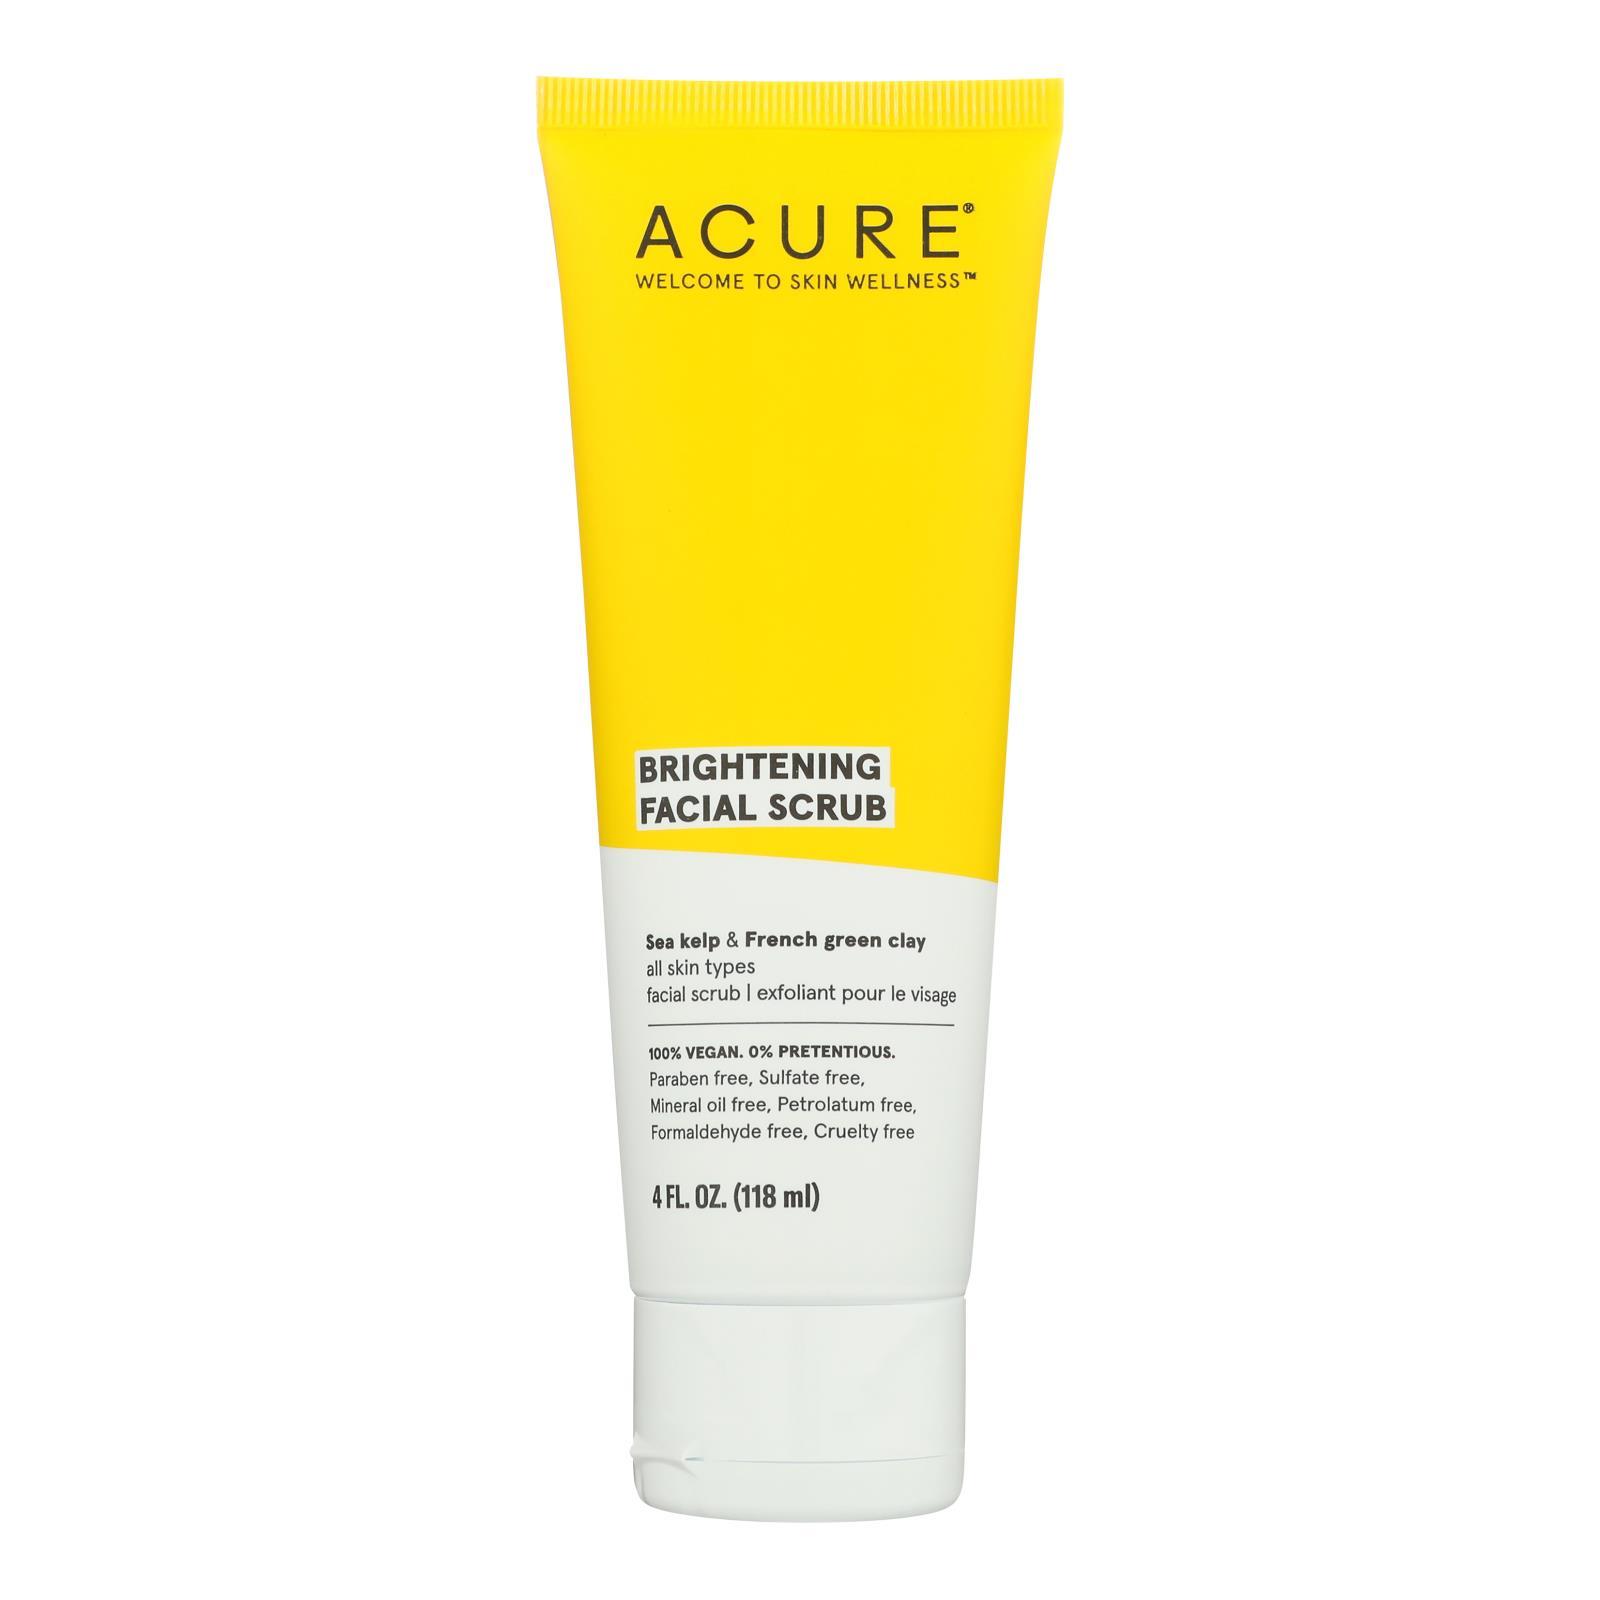 Acure - Brightening Facial Scrub - Argan Extract and Chlorella - 4 FL oz.